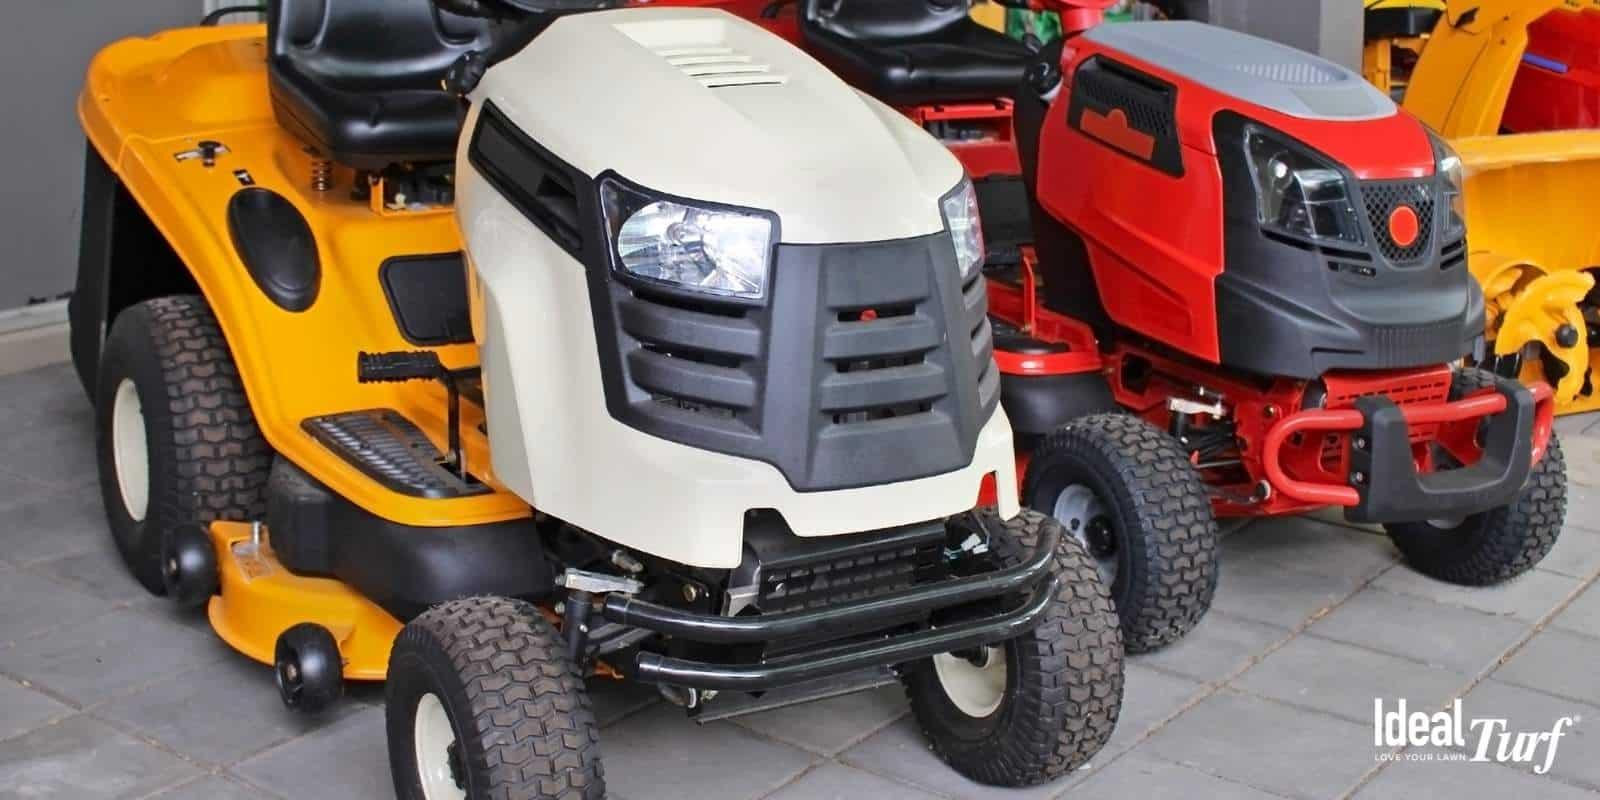 13. Eliminates Expensive Lawn-Care Equipment